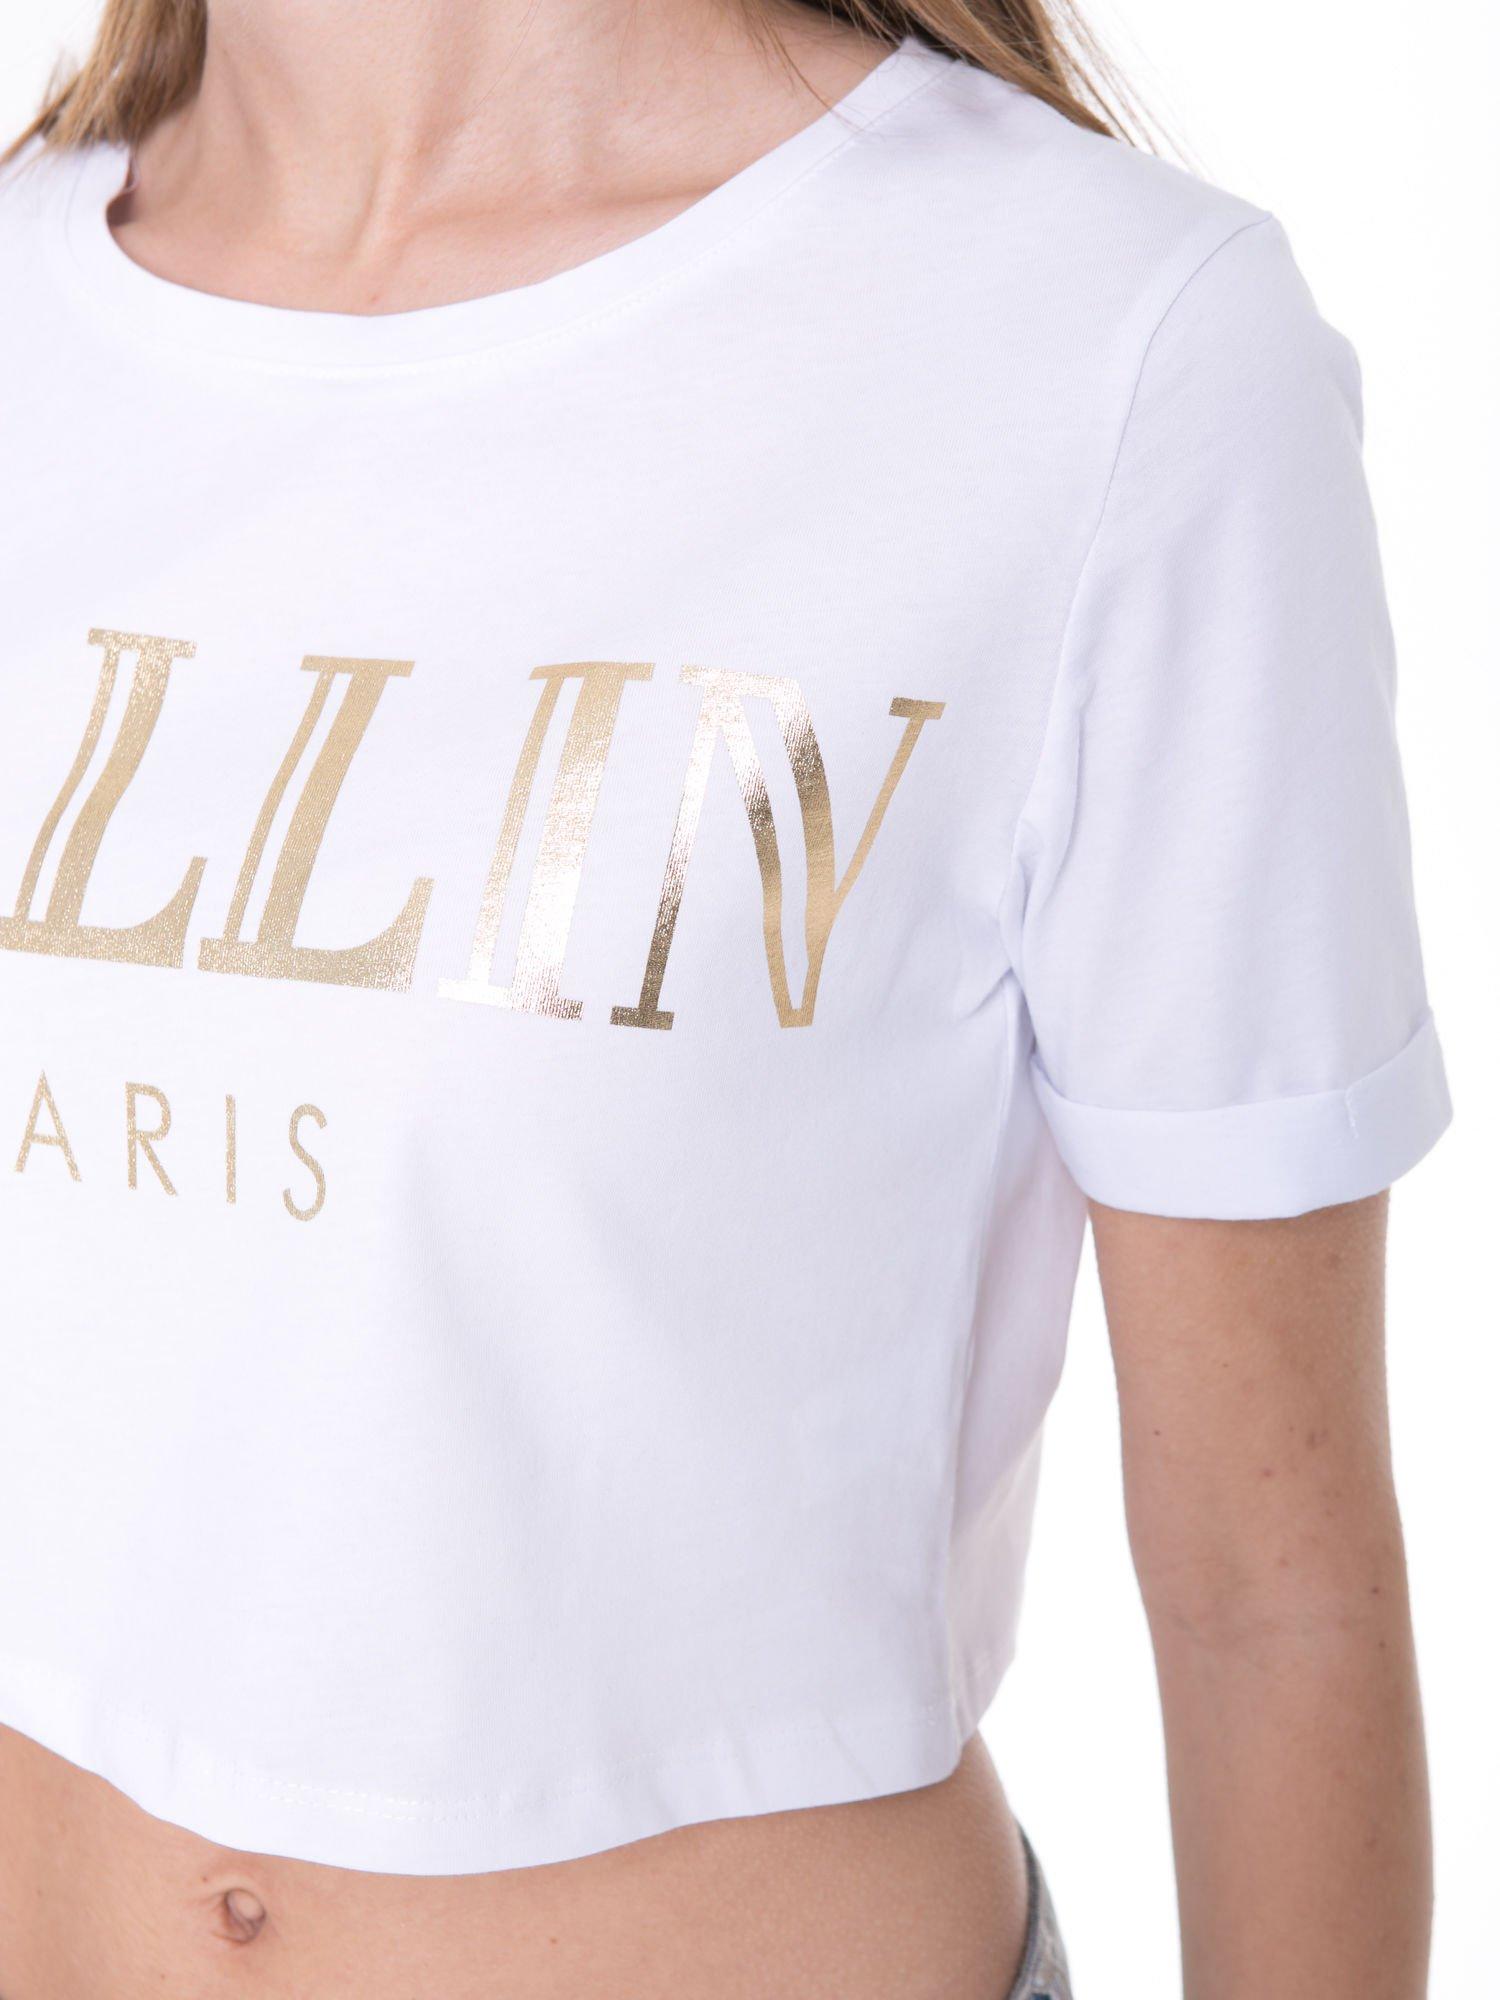 Biały t-shirt typu crop top ze złotym napisem BALLIN PARIS                                  zdj.                                  7